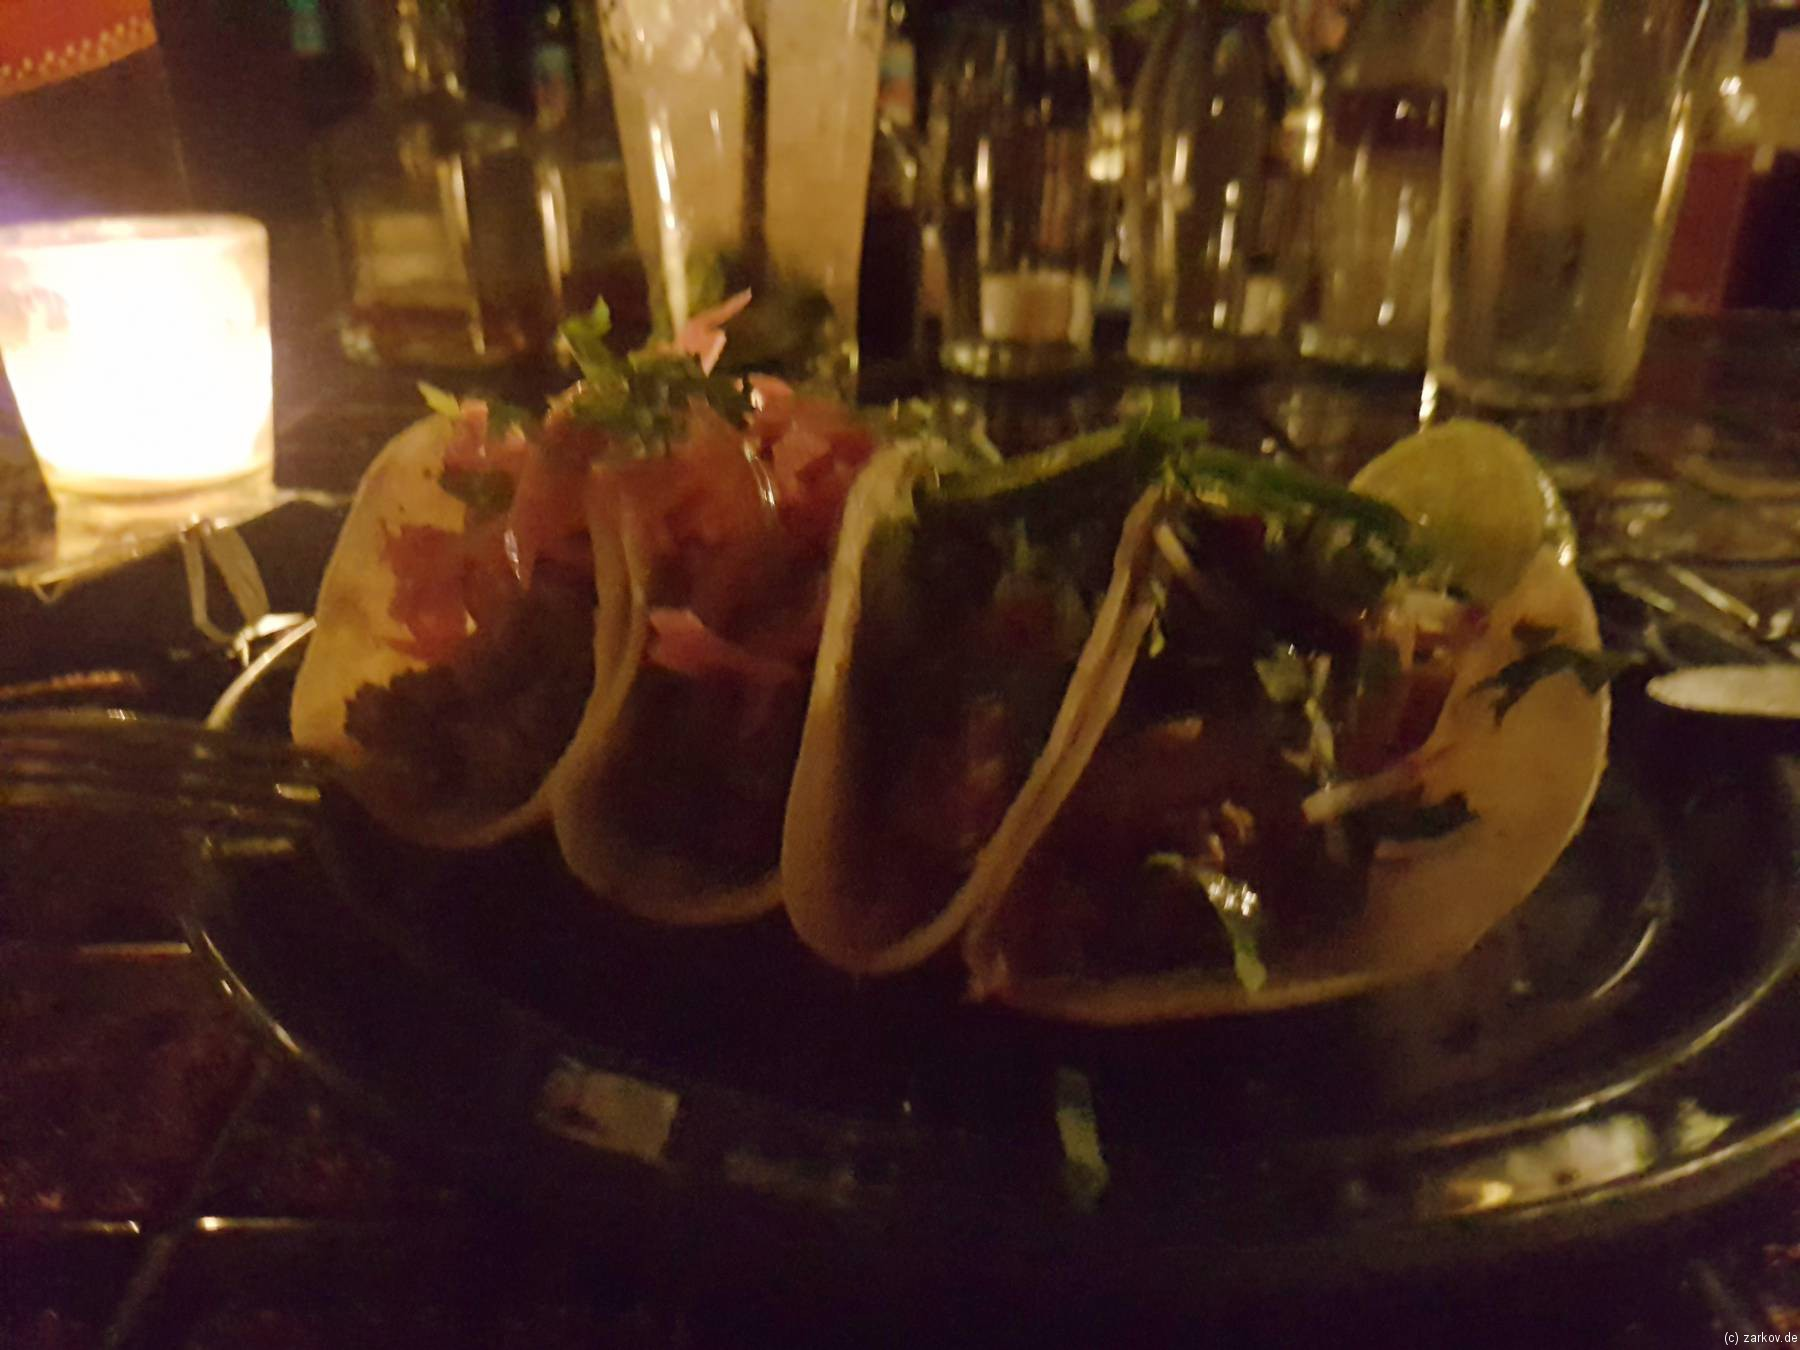 Mayahuel - Tacos mit selbstgemachter Chorizo und Tinga